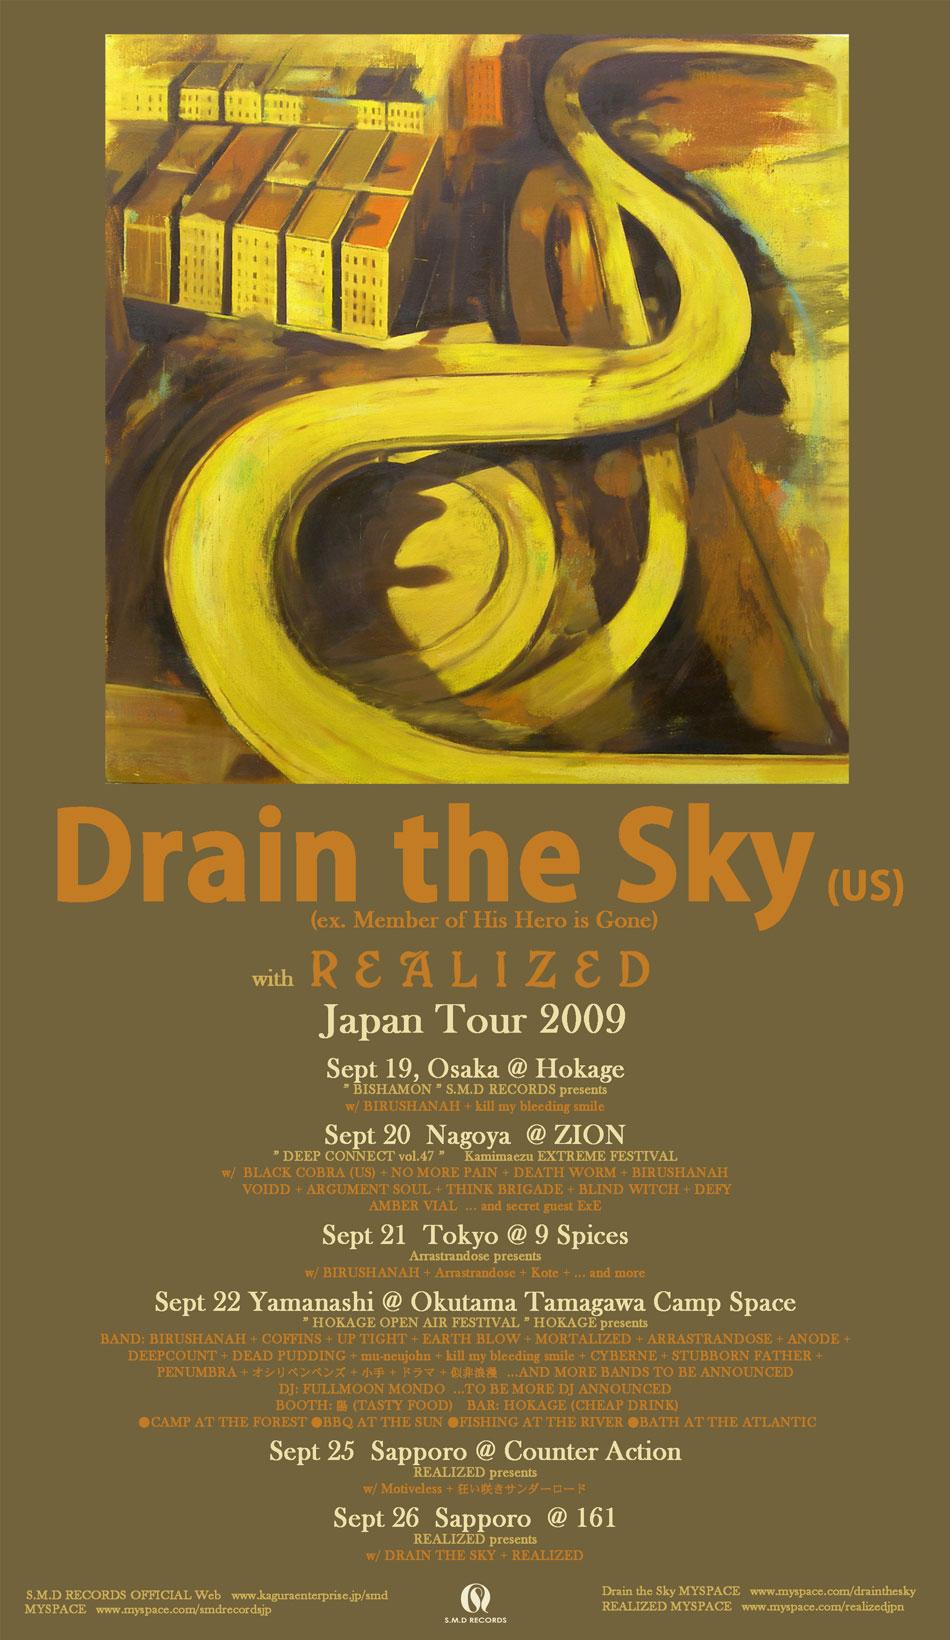 Drain The Sky - Japan Tour 2009